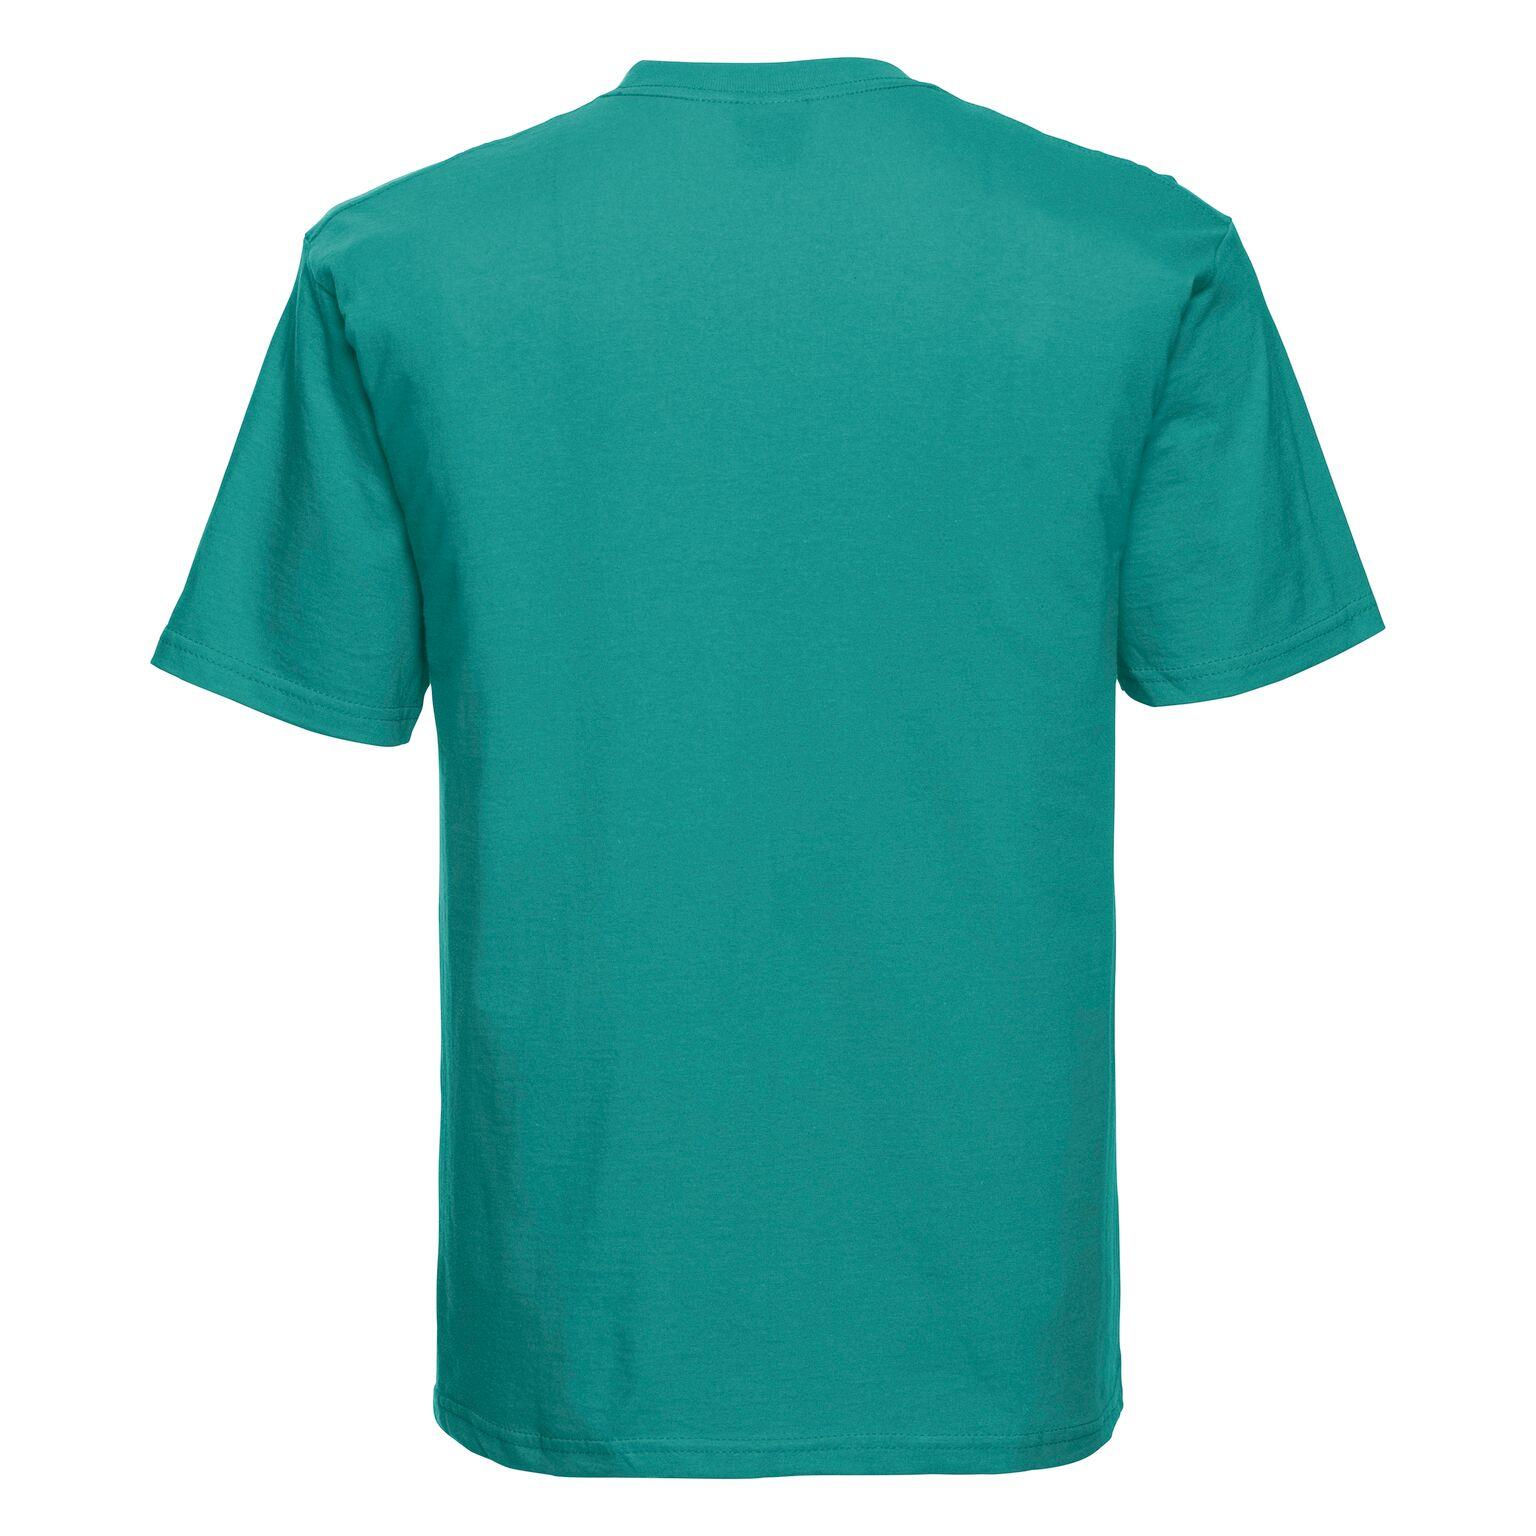 05_j180m_turquoise--0-0--772d50f2-21b8-4c87-aa05-0d59b11b59bd